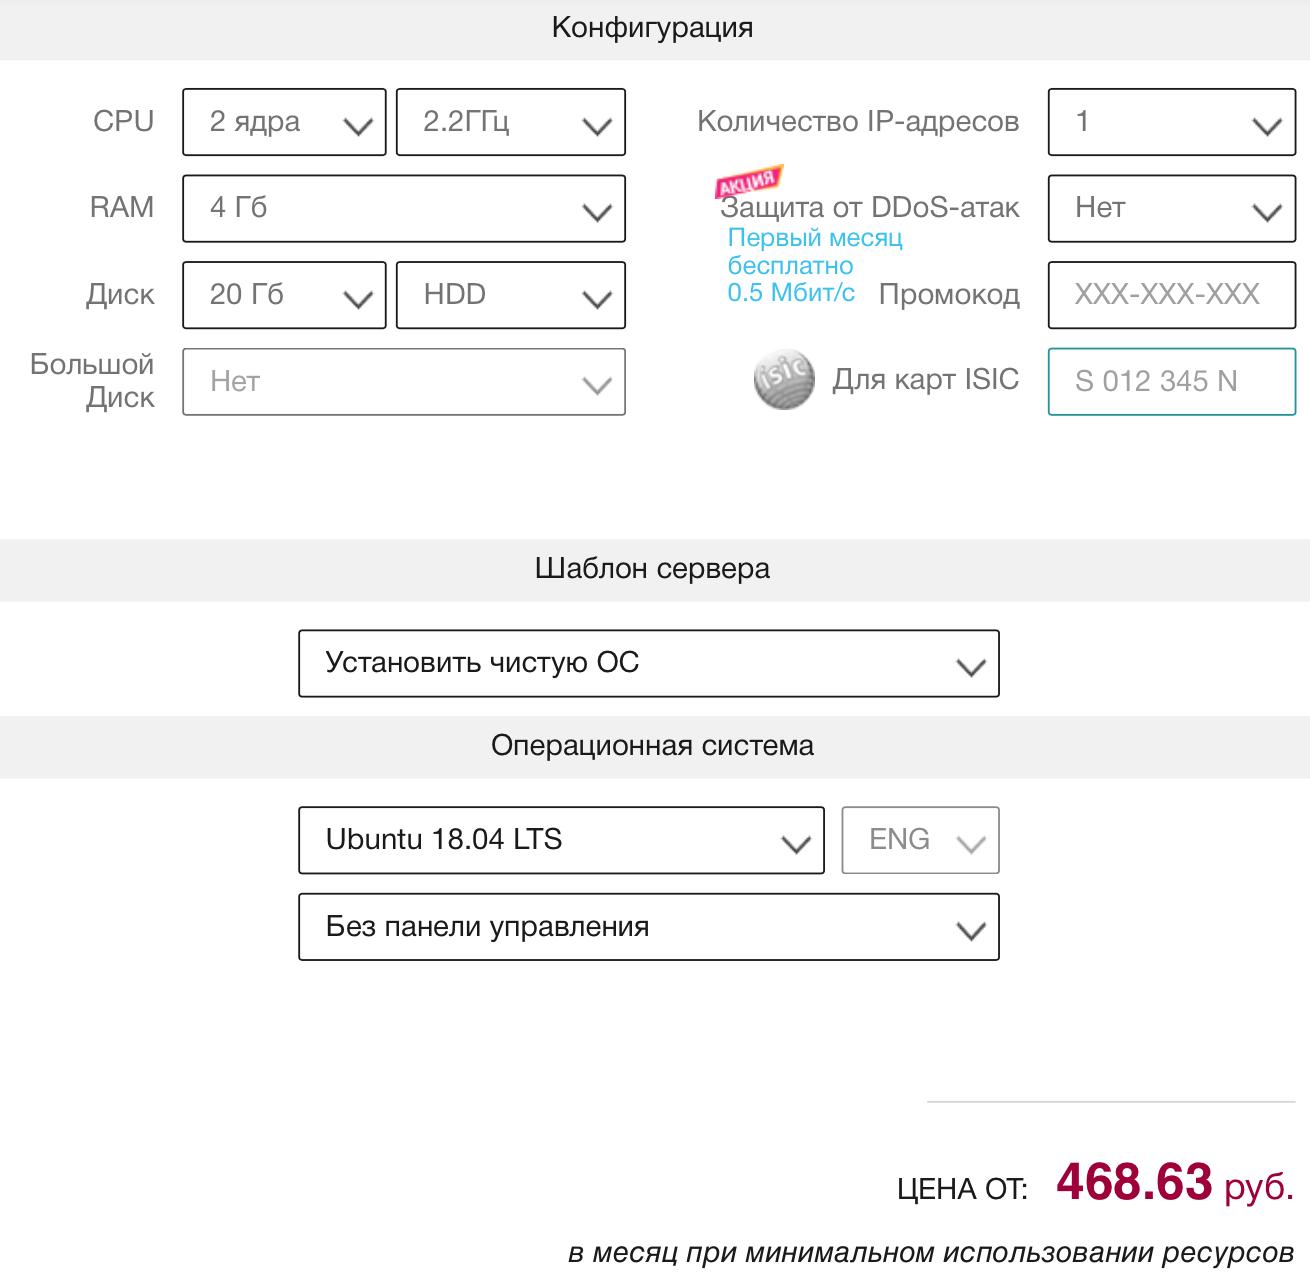 VPS на Linux с графическим интерфейсом: запускаем сервер RDP на Ubuntu 18.04 - 2